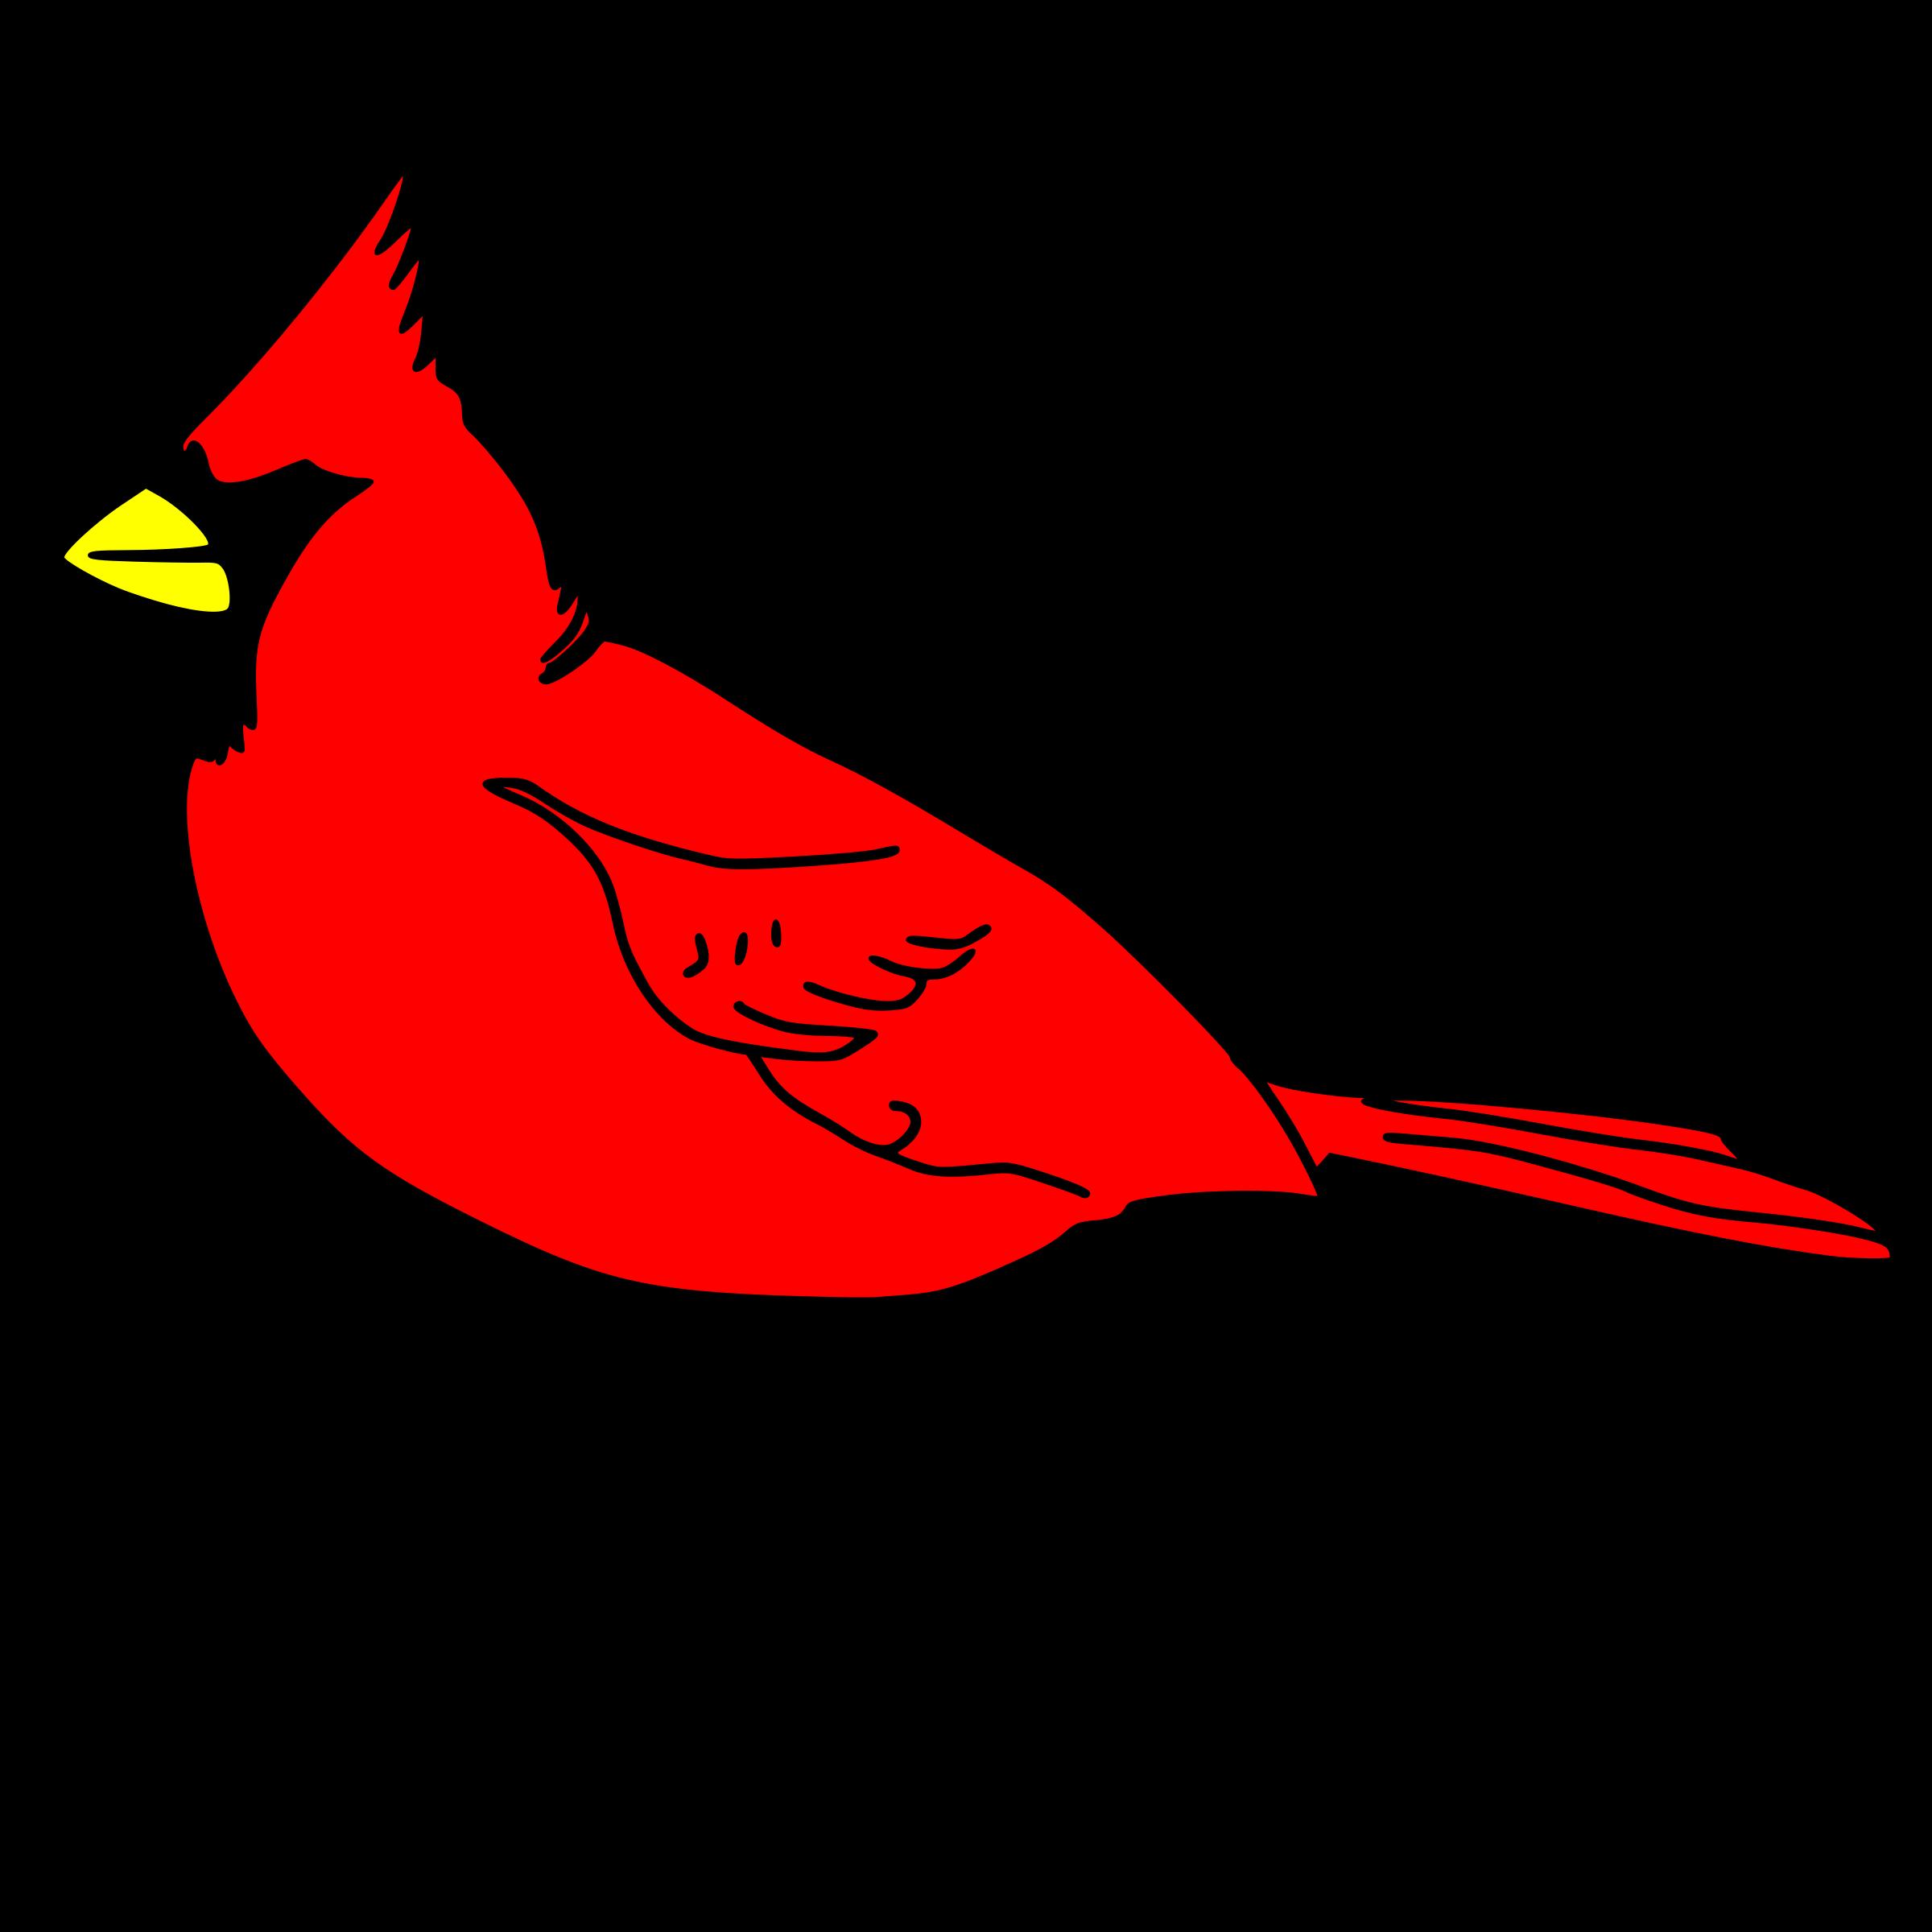 Cardinals baseball cap clipart picture transparent stock Clipart - cardinal remix 1 picture transparent stock